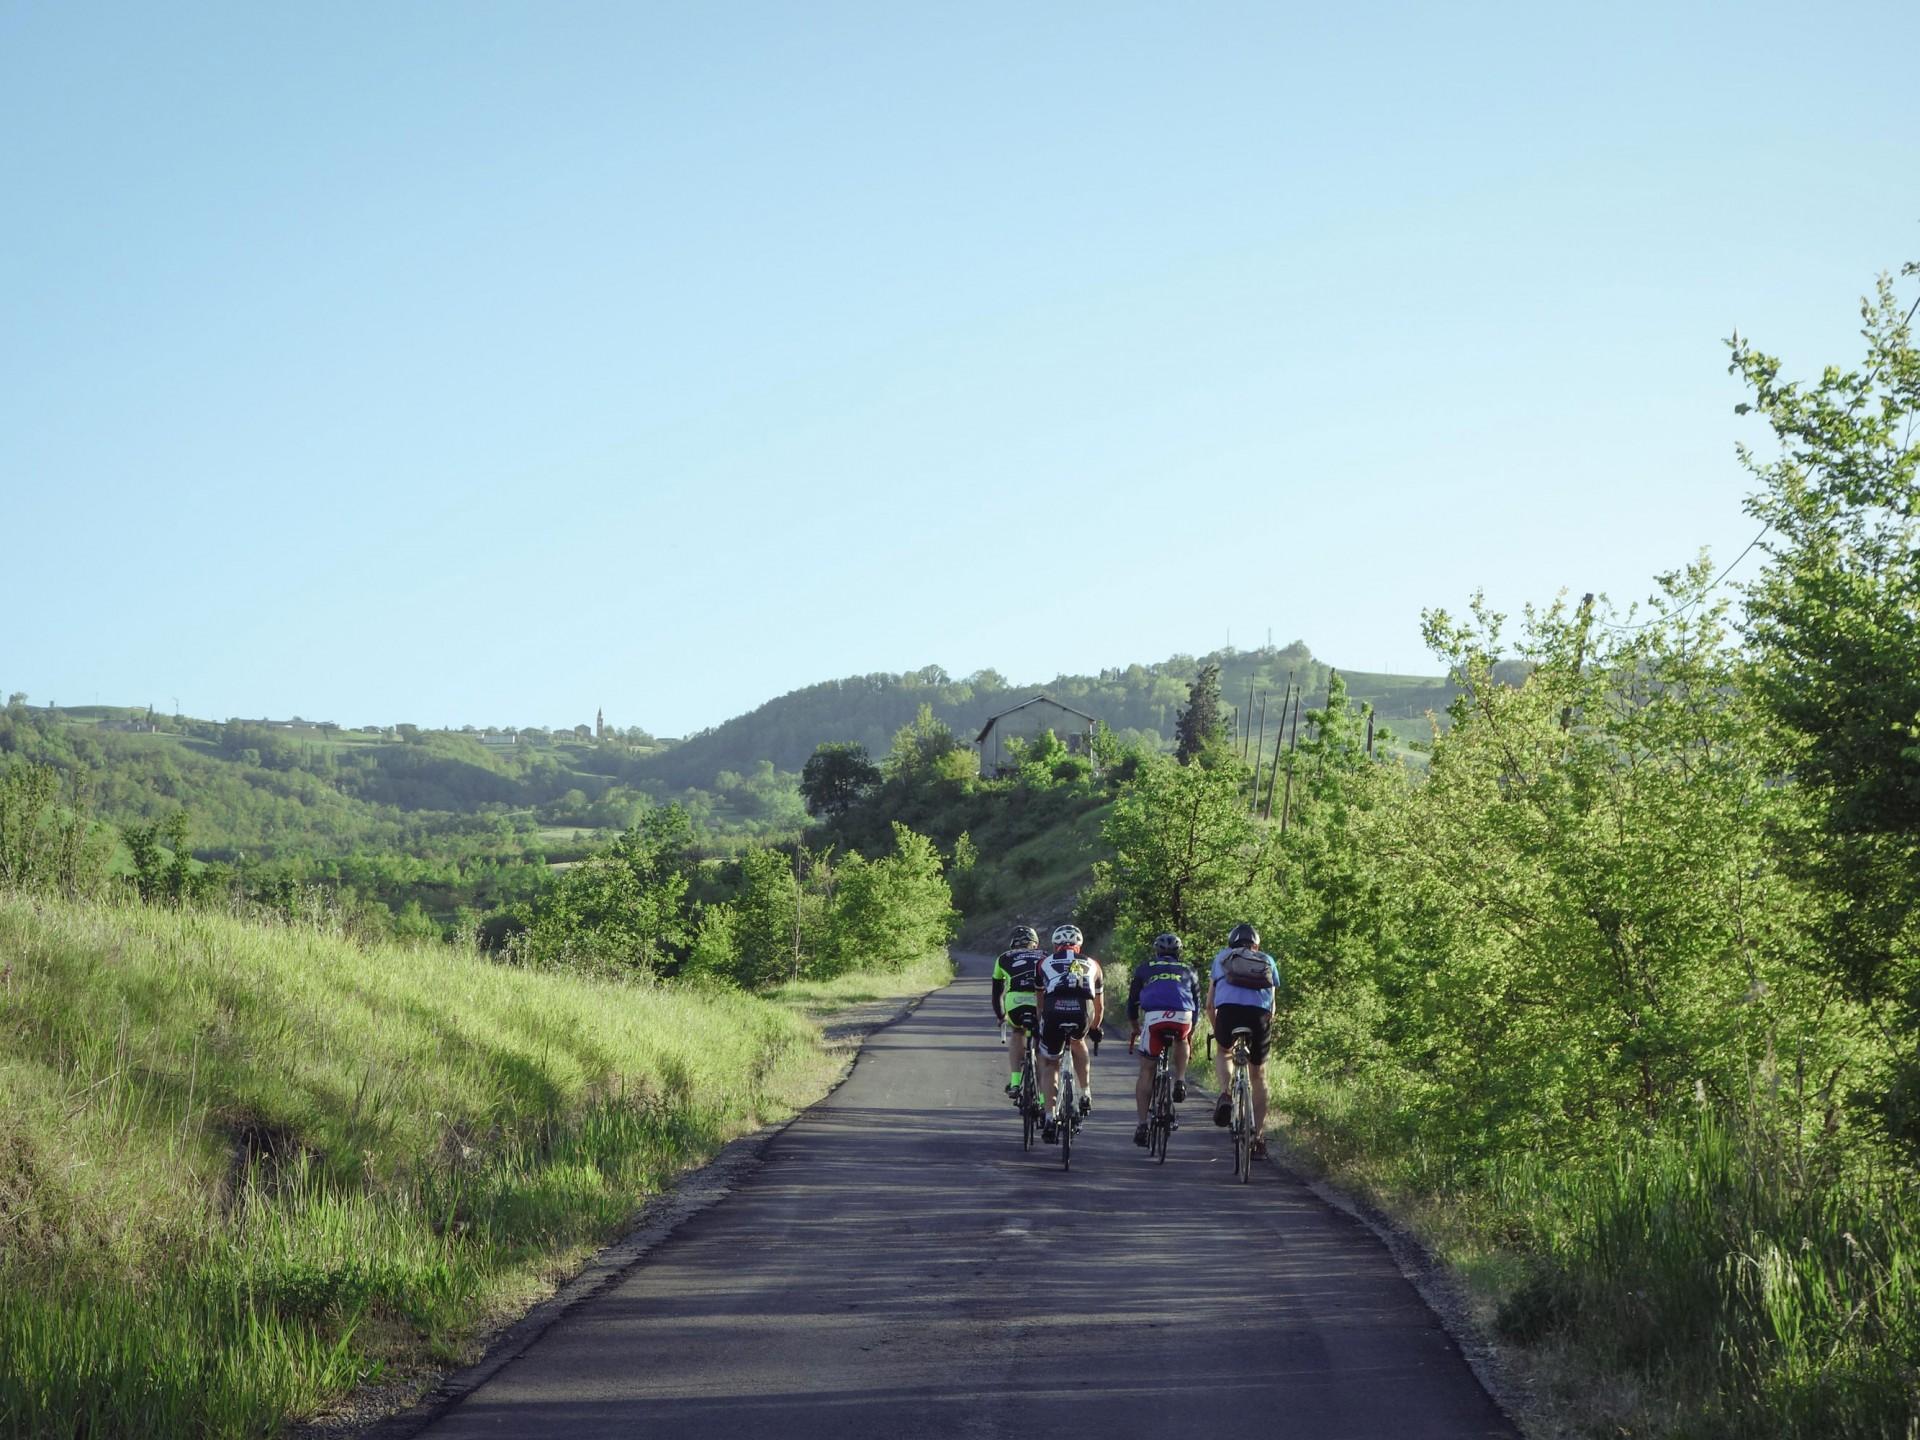 erman-bike-sunset-ride-4-06808